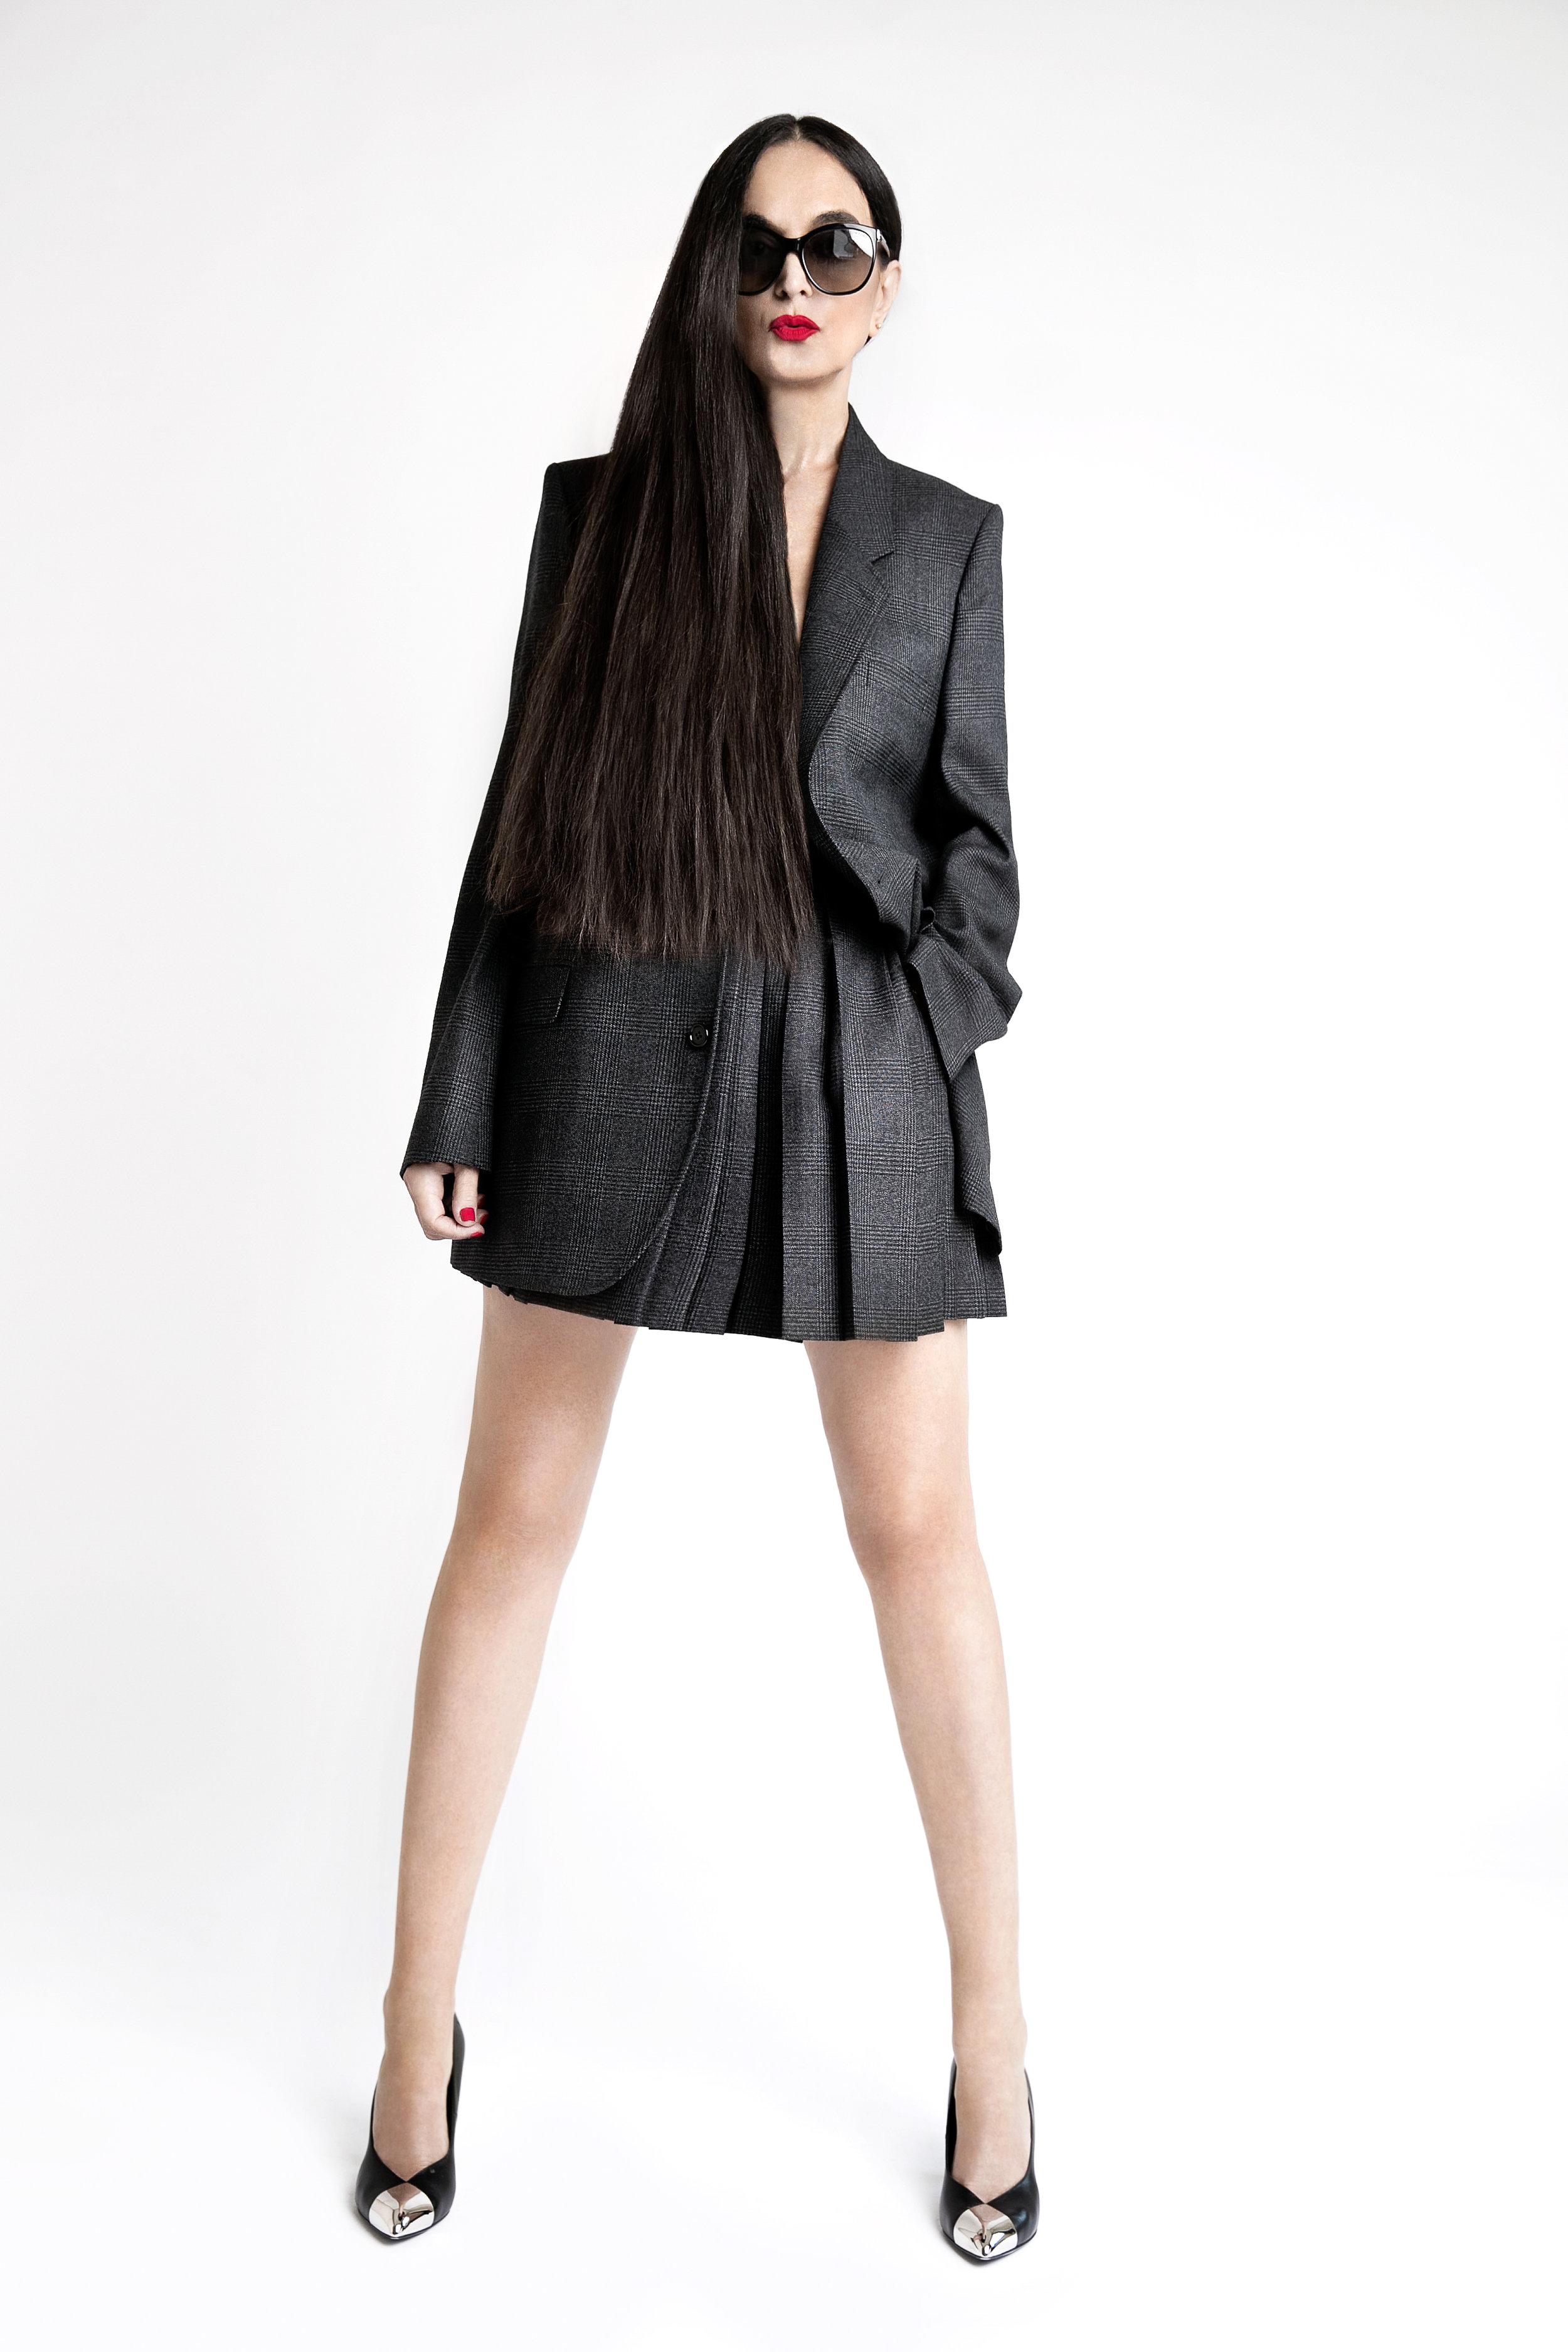 Suit and shoes Céline, Sunglasses Tom Ford. Photo  Lena Di